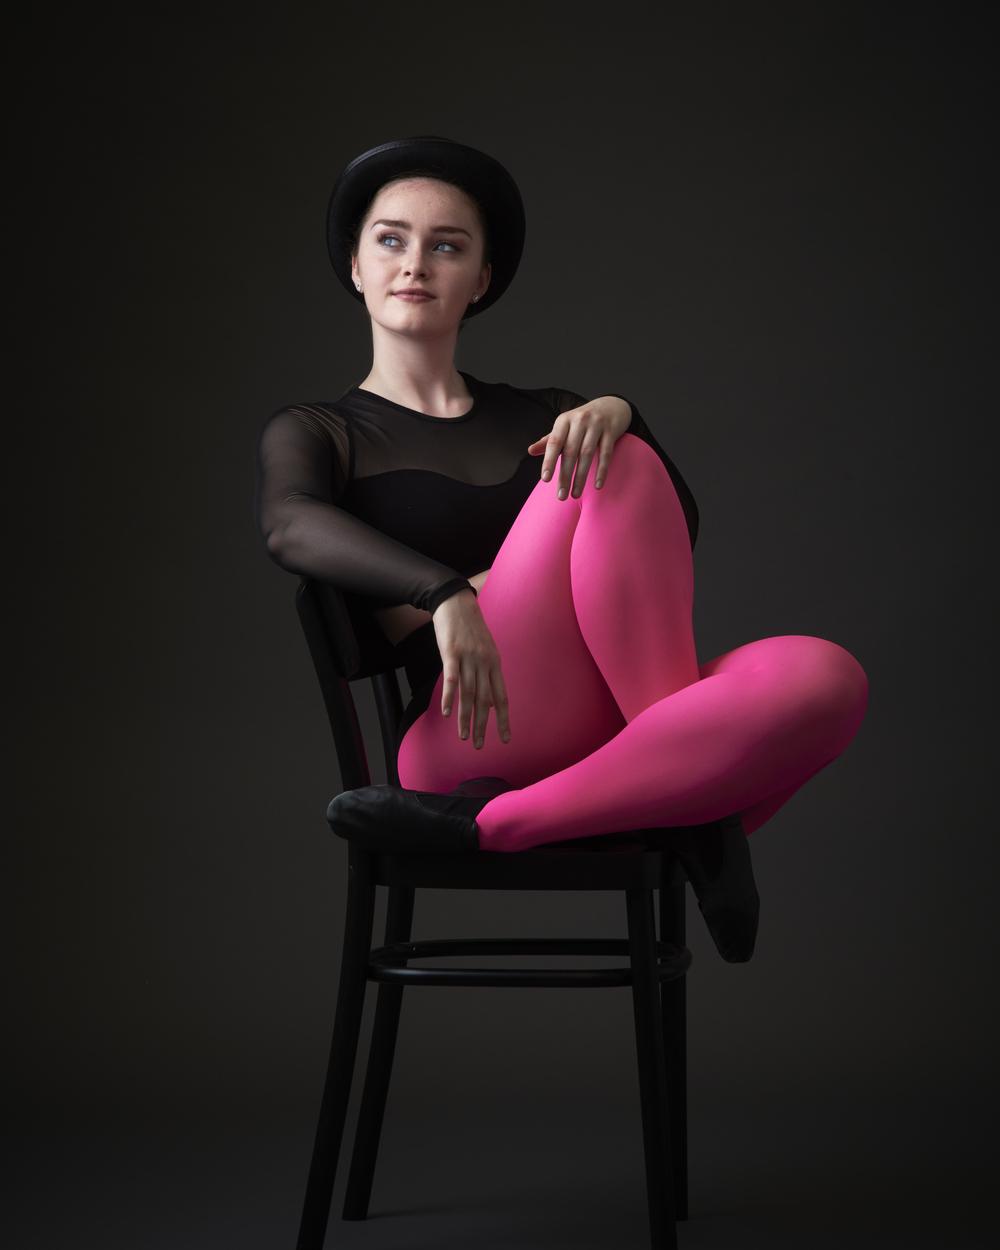 FotoFun Elise Phillipi Ballet_DSC2892_PSD_HR.jpg